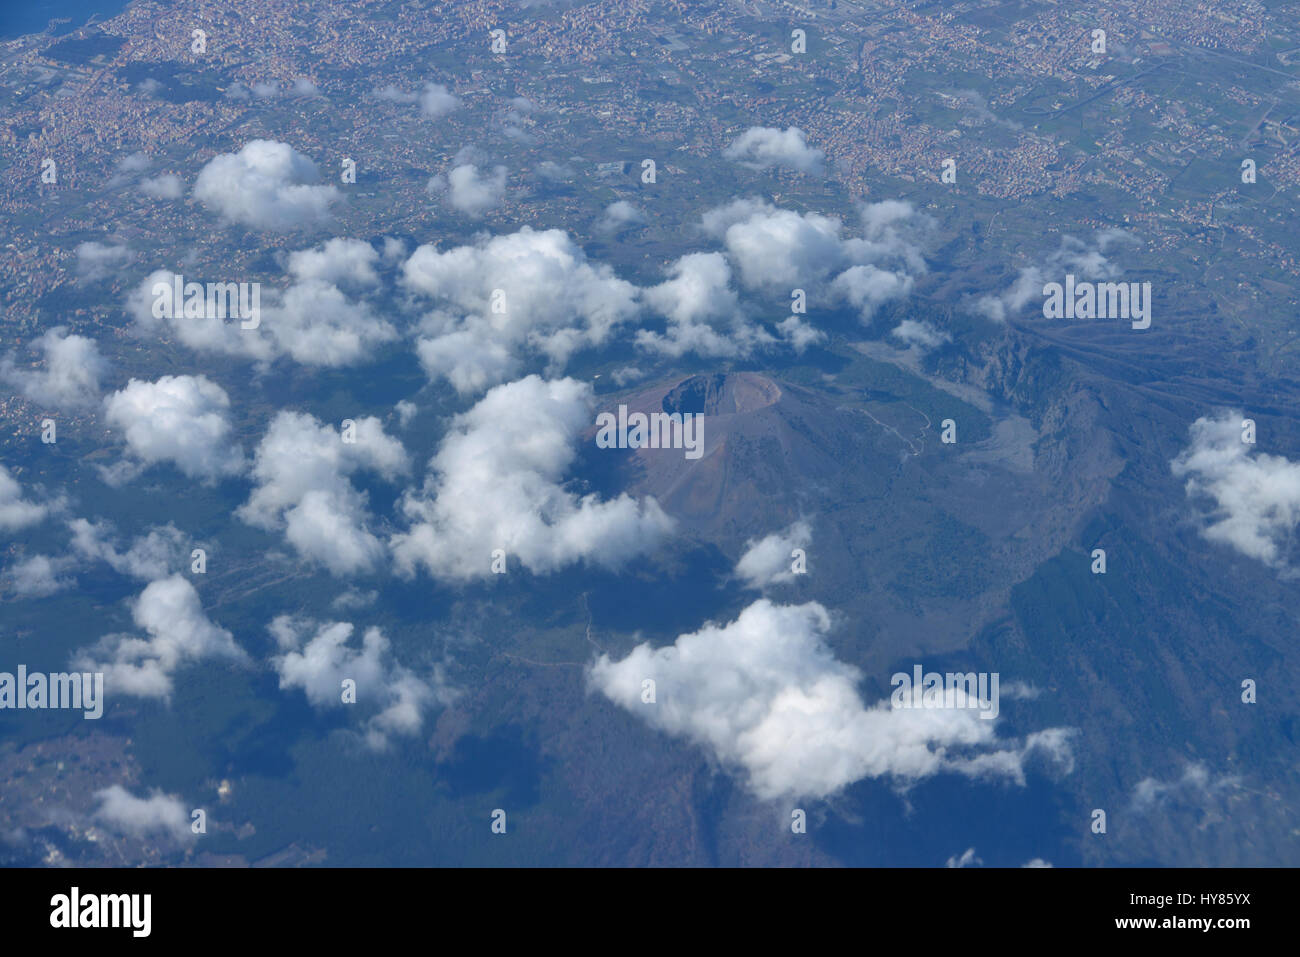 Volcano, Vesuvius, Italy, Vulkan, Vesuv, Italien - Stock Image